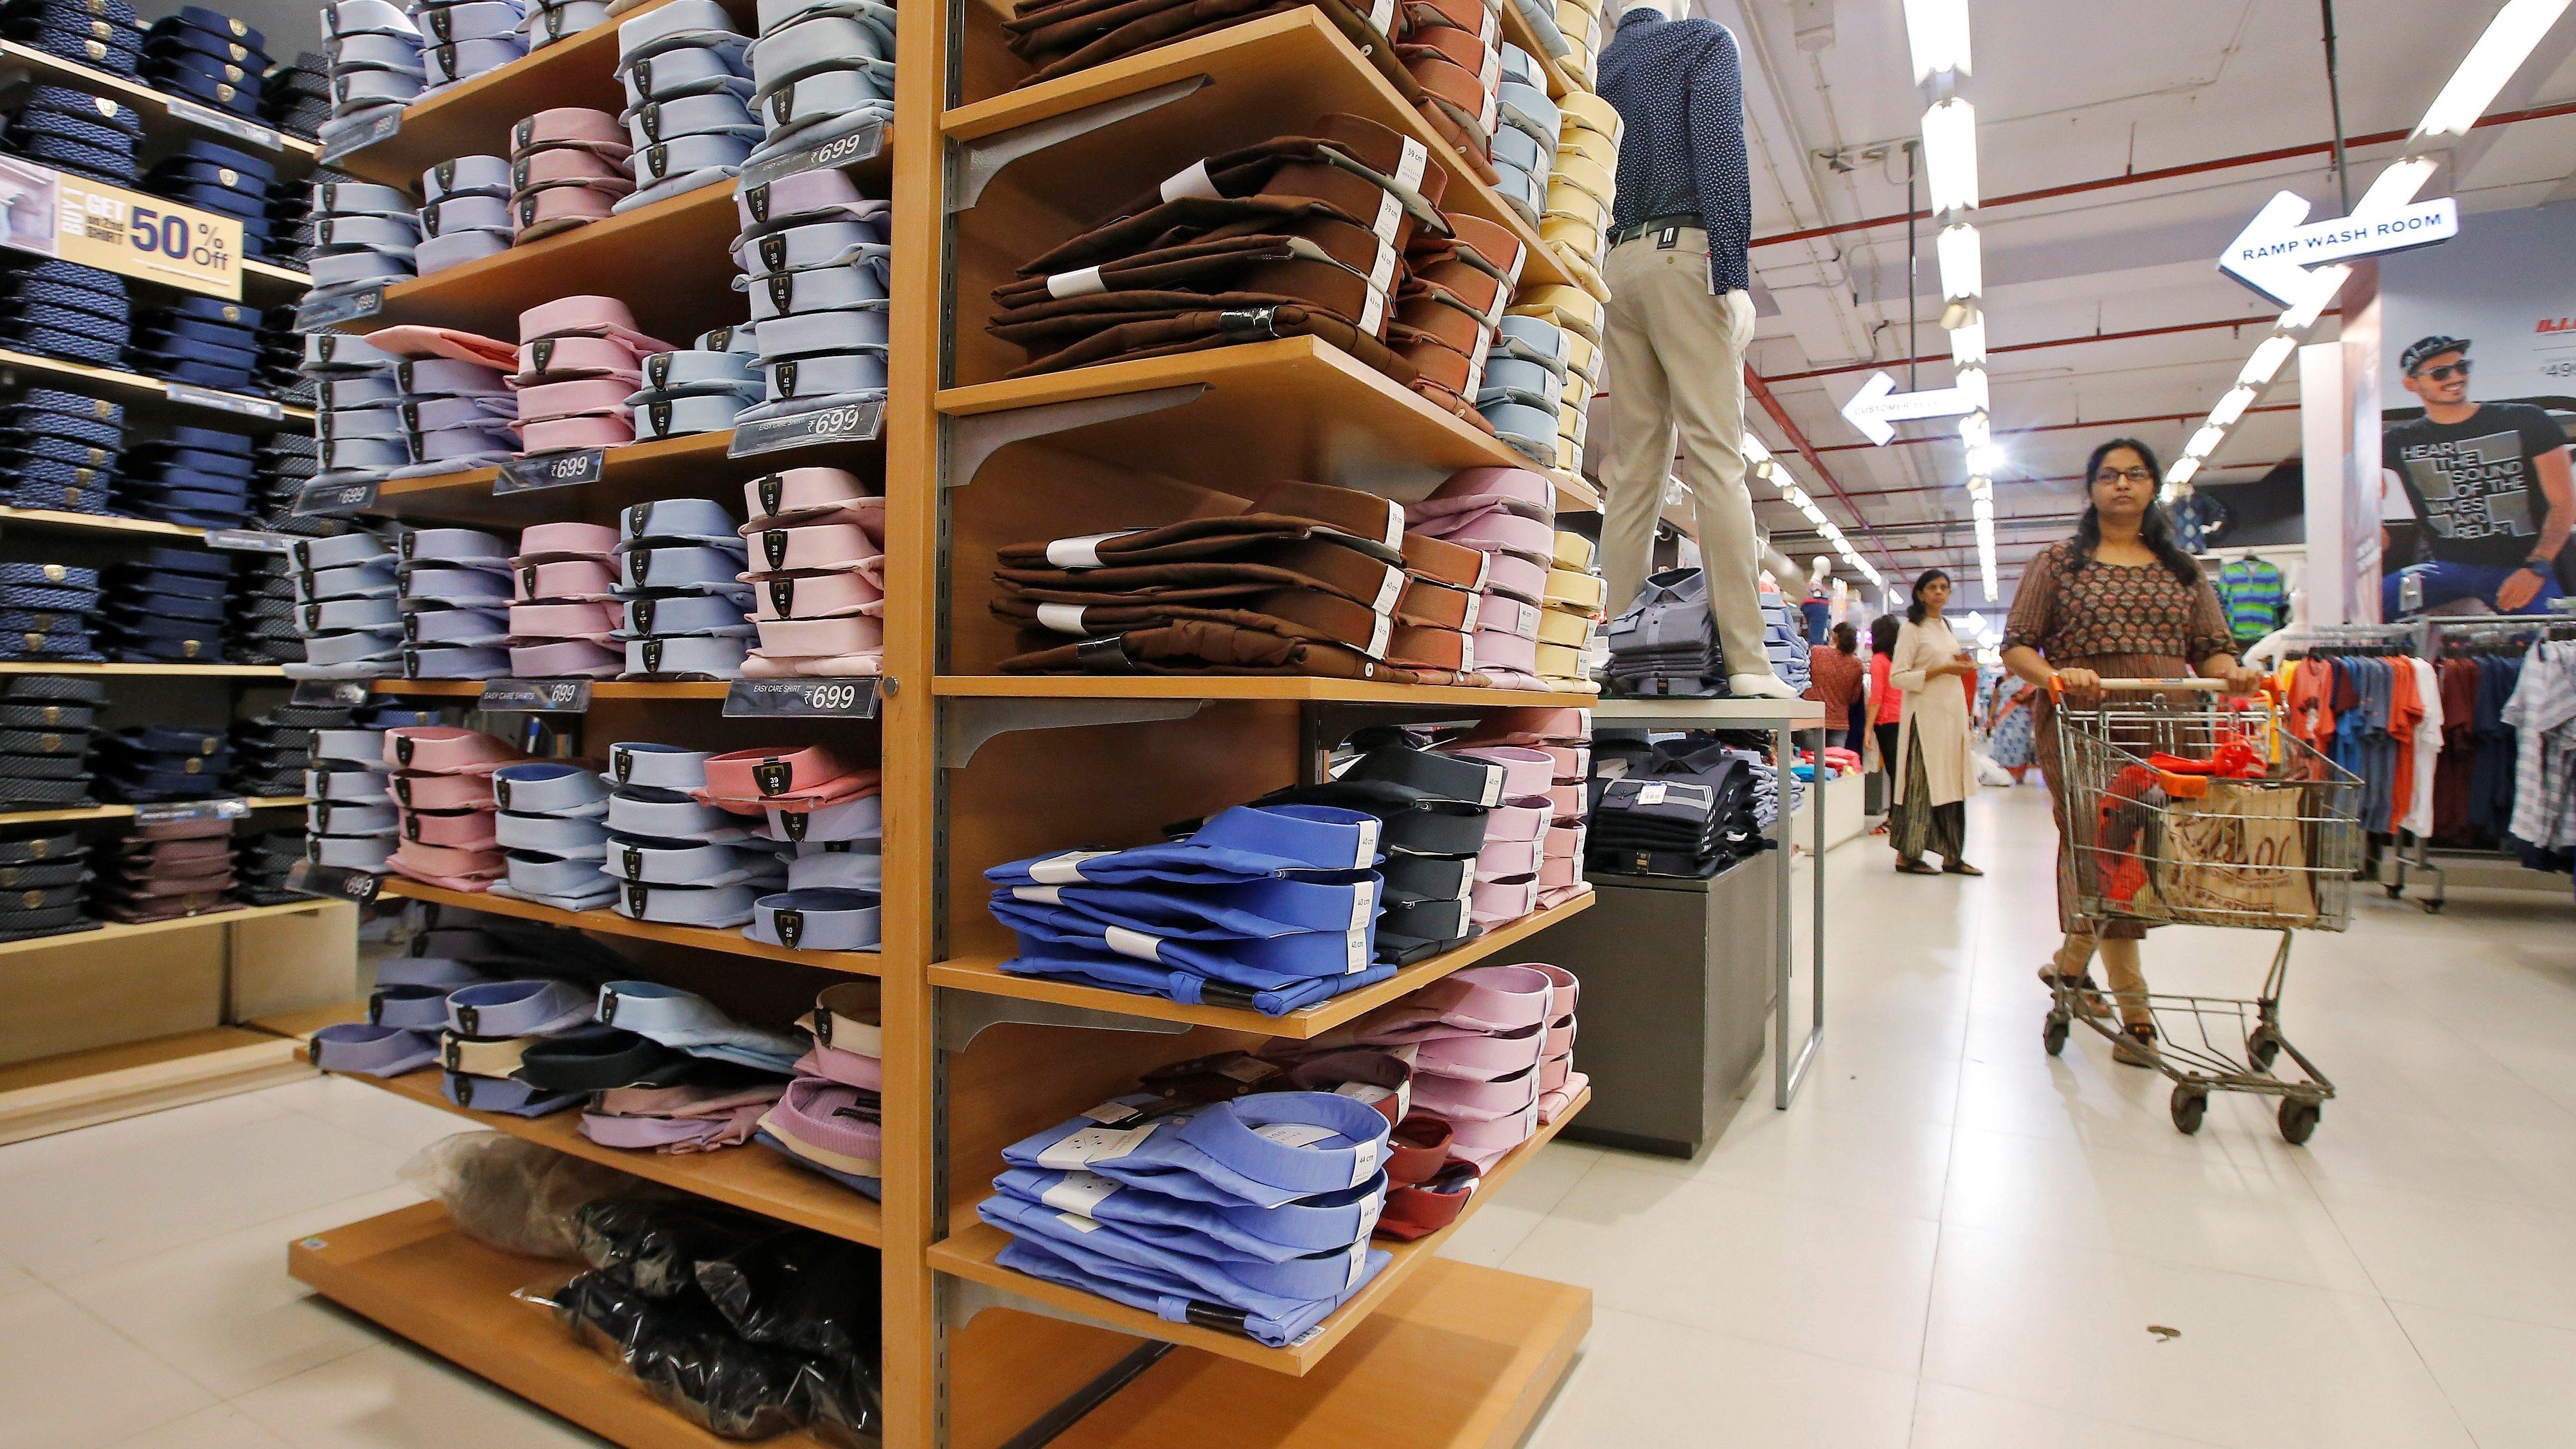 A customer walk inside a clothes store at a shopping mall in Kolkata